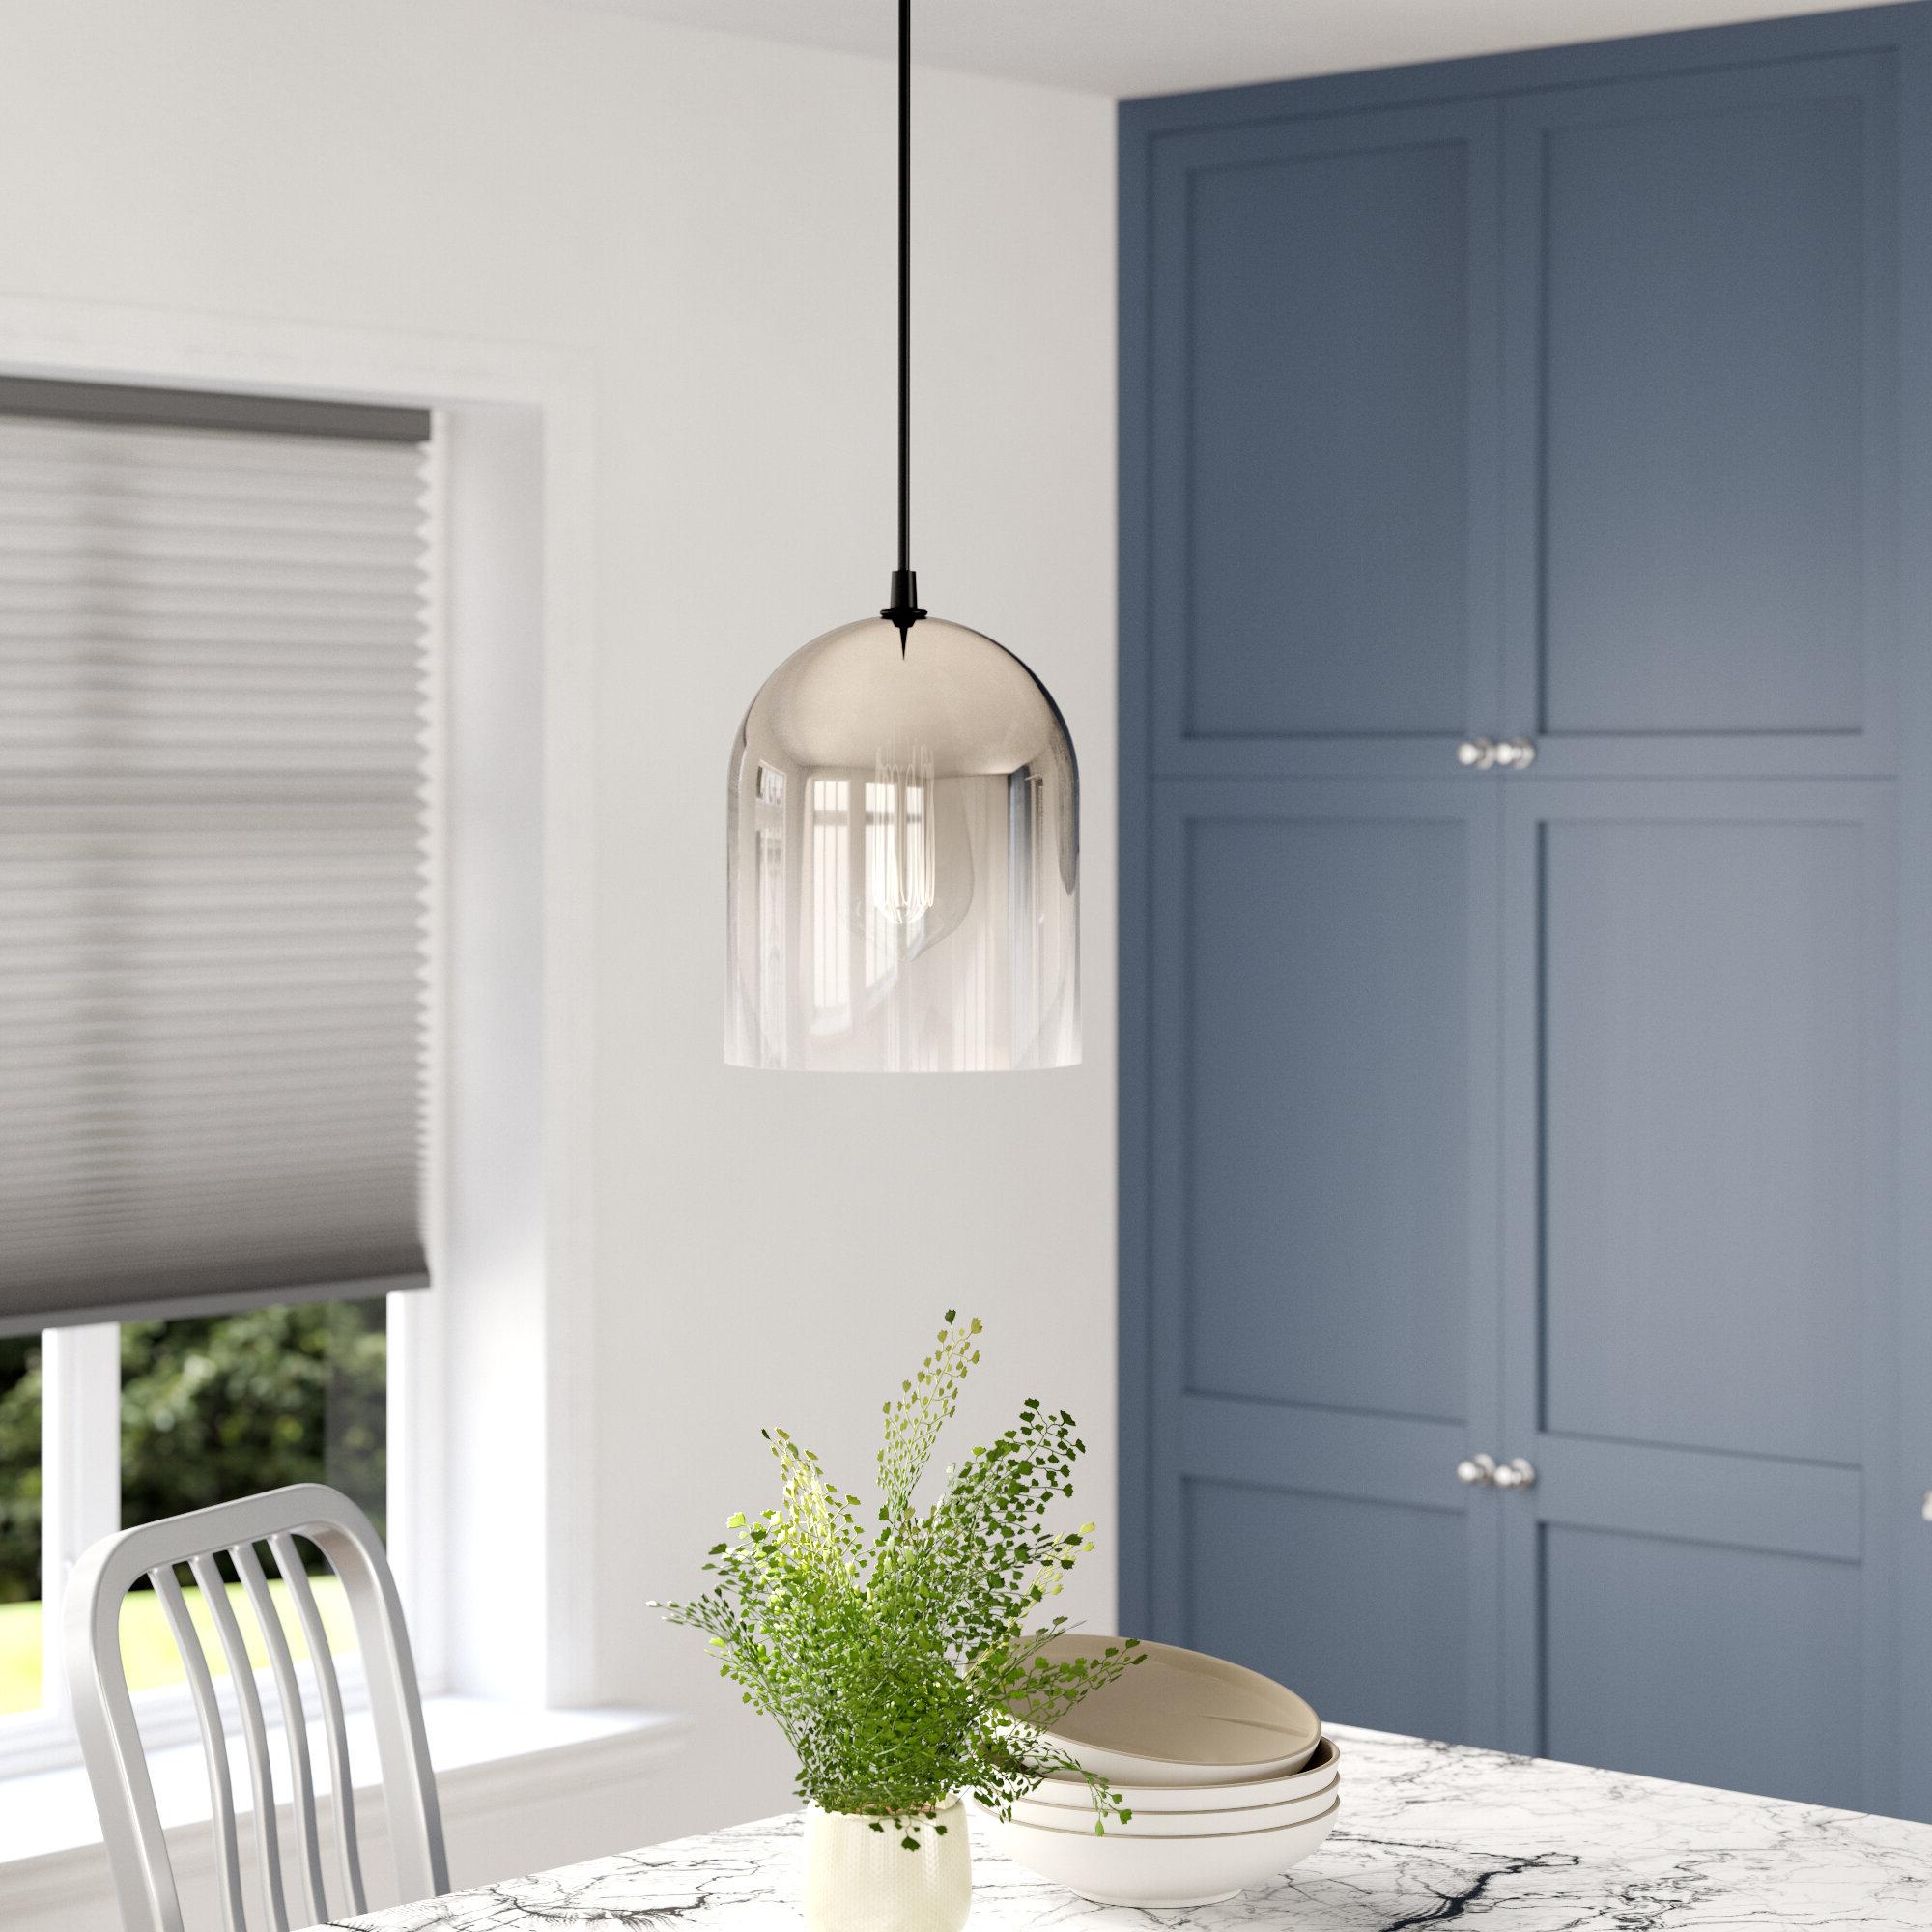 Fashionable Giacinta 1 Light Single Bell Pendants For Ebern Designs Mccue 1 Light Single Bell Pendant & Reviews (View 6 of 25)